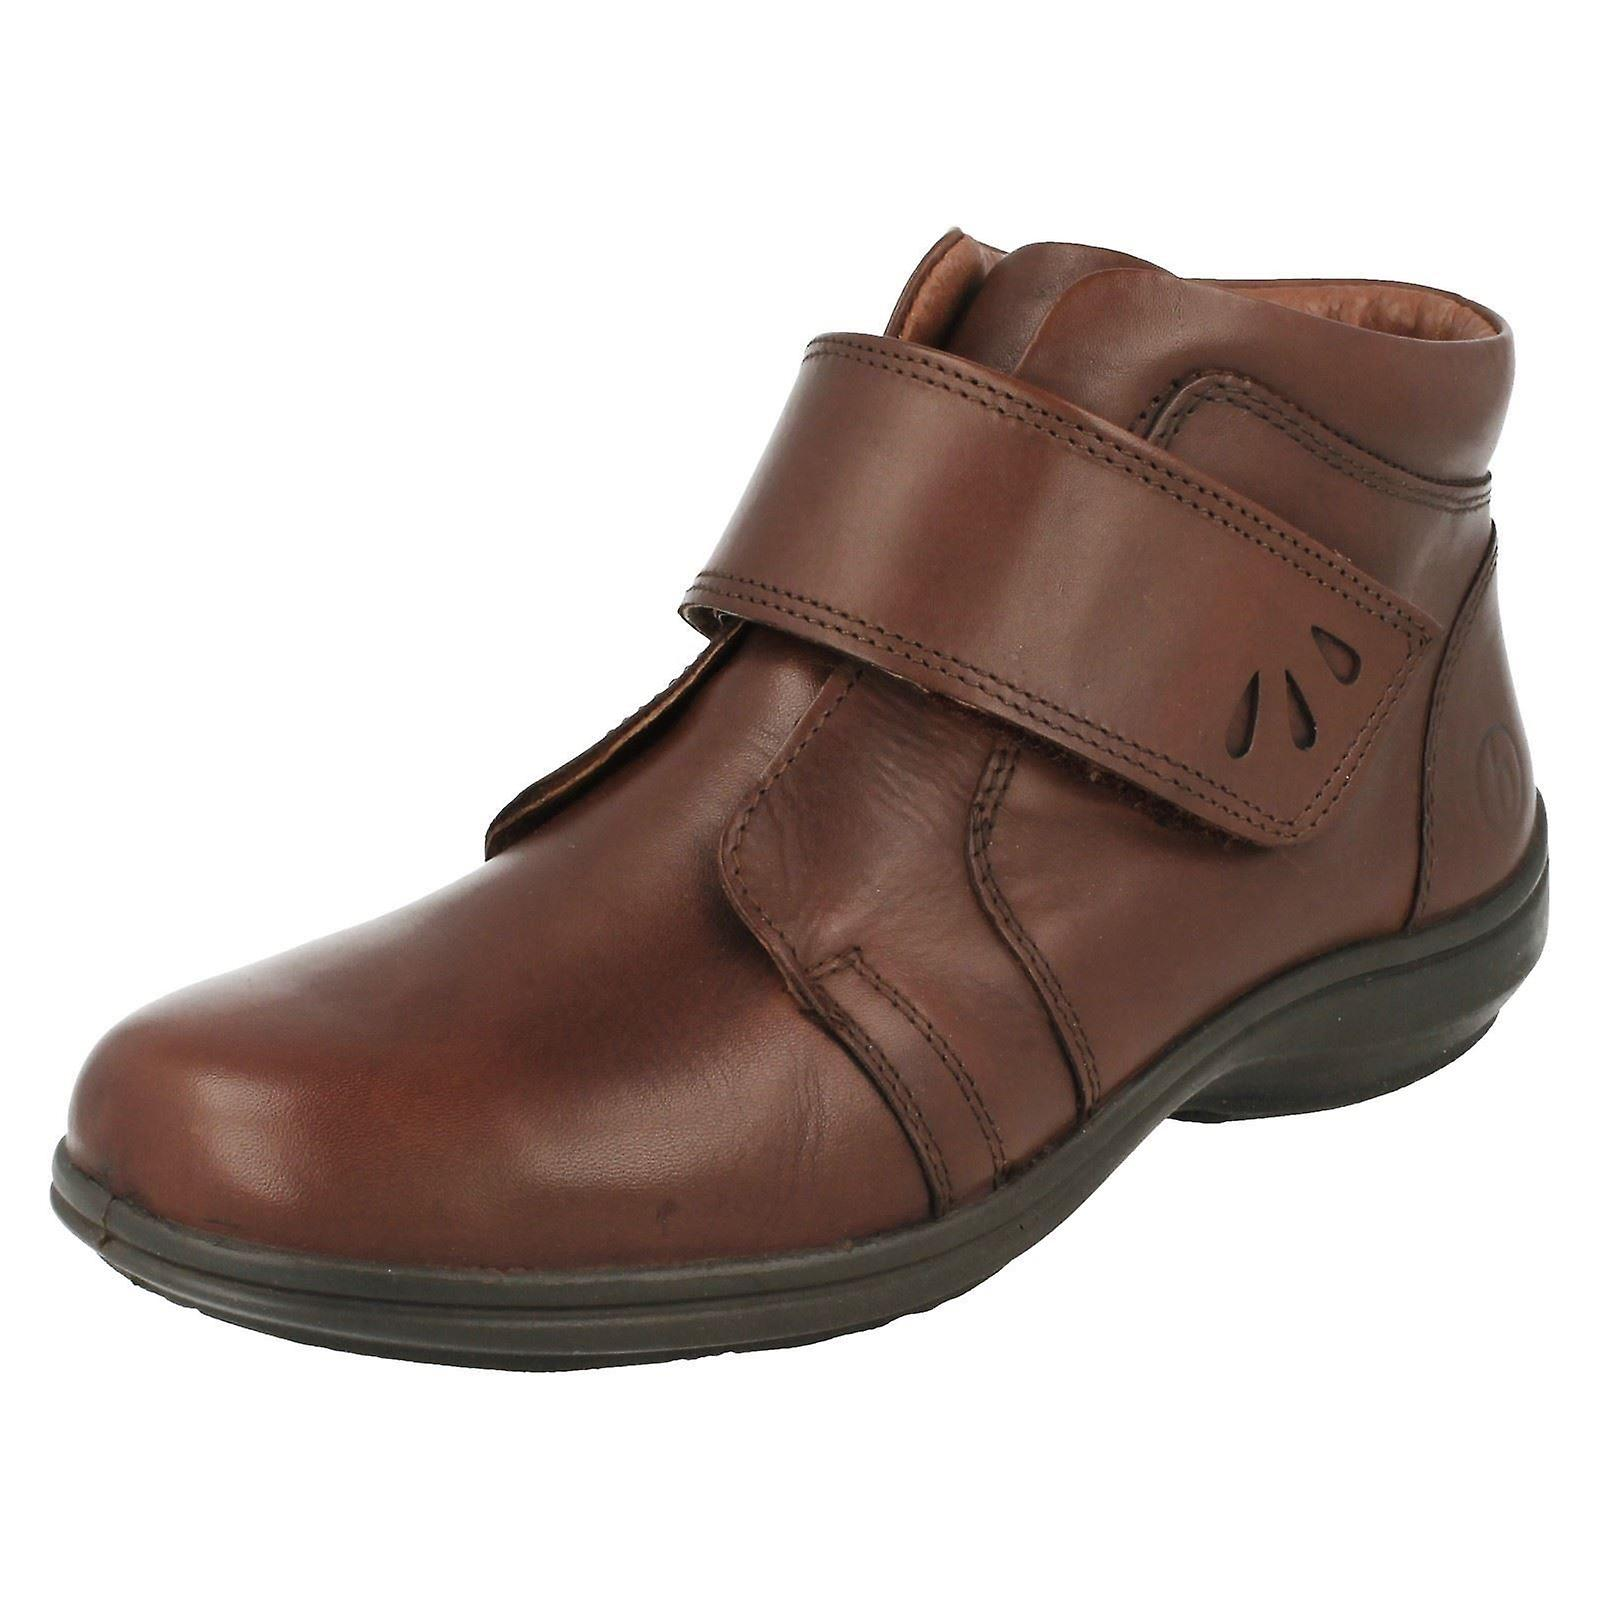 Panie łatwe B pasek kostki buty ścieżka v9ELd